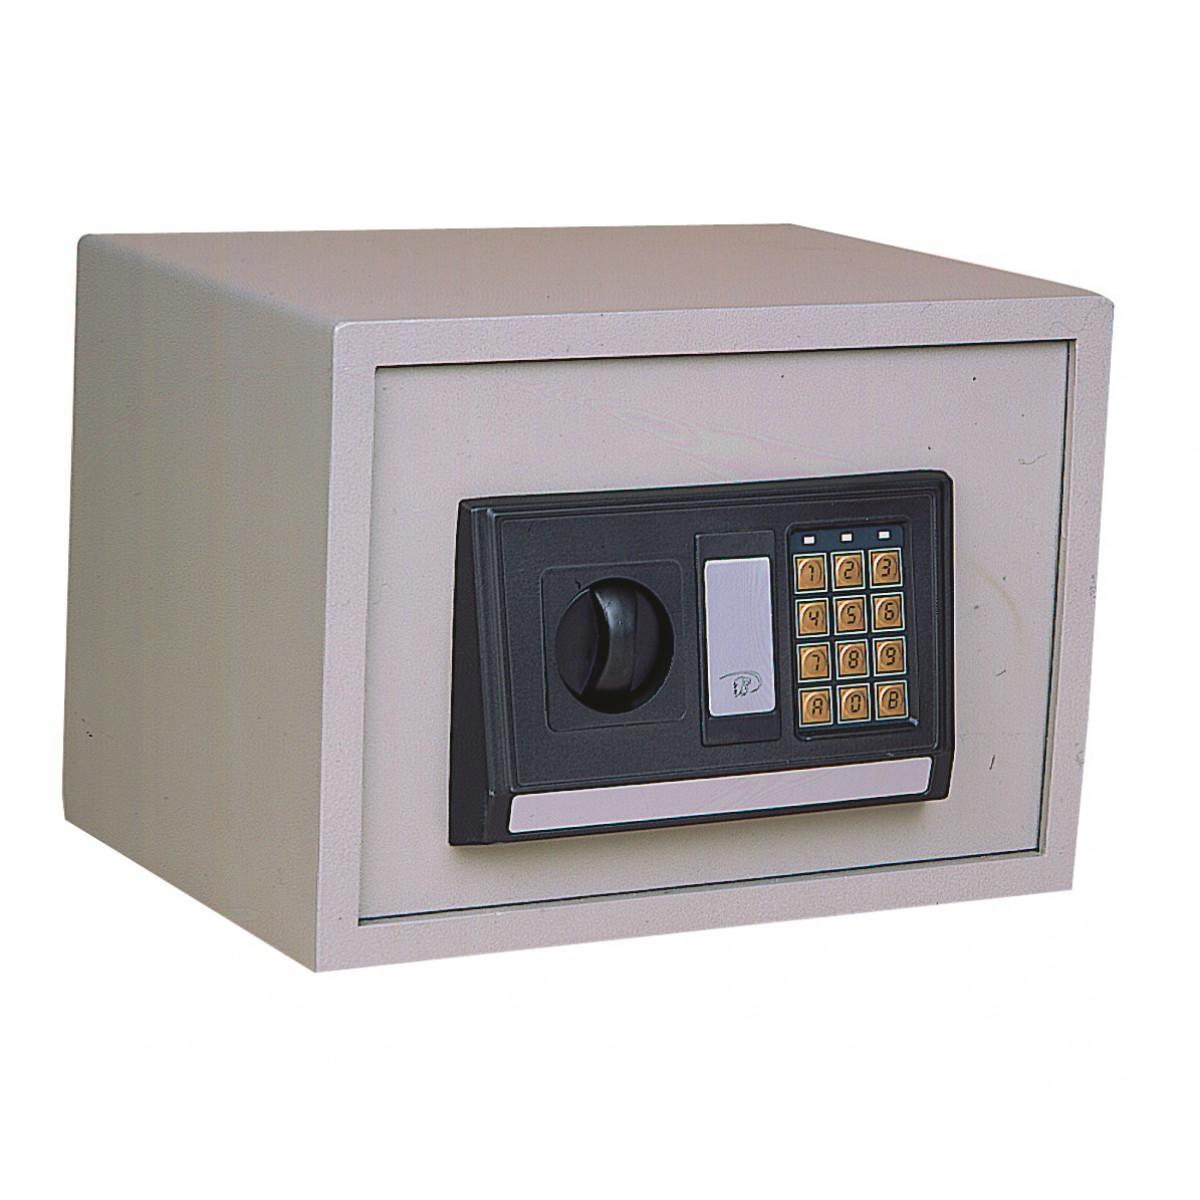 coffre fort poser pr lude lectronique decayeux beige. Black Bedroom Furniture Sets. Home Design Ideas